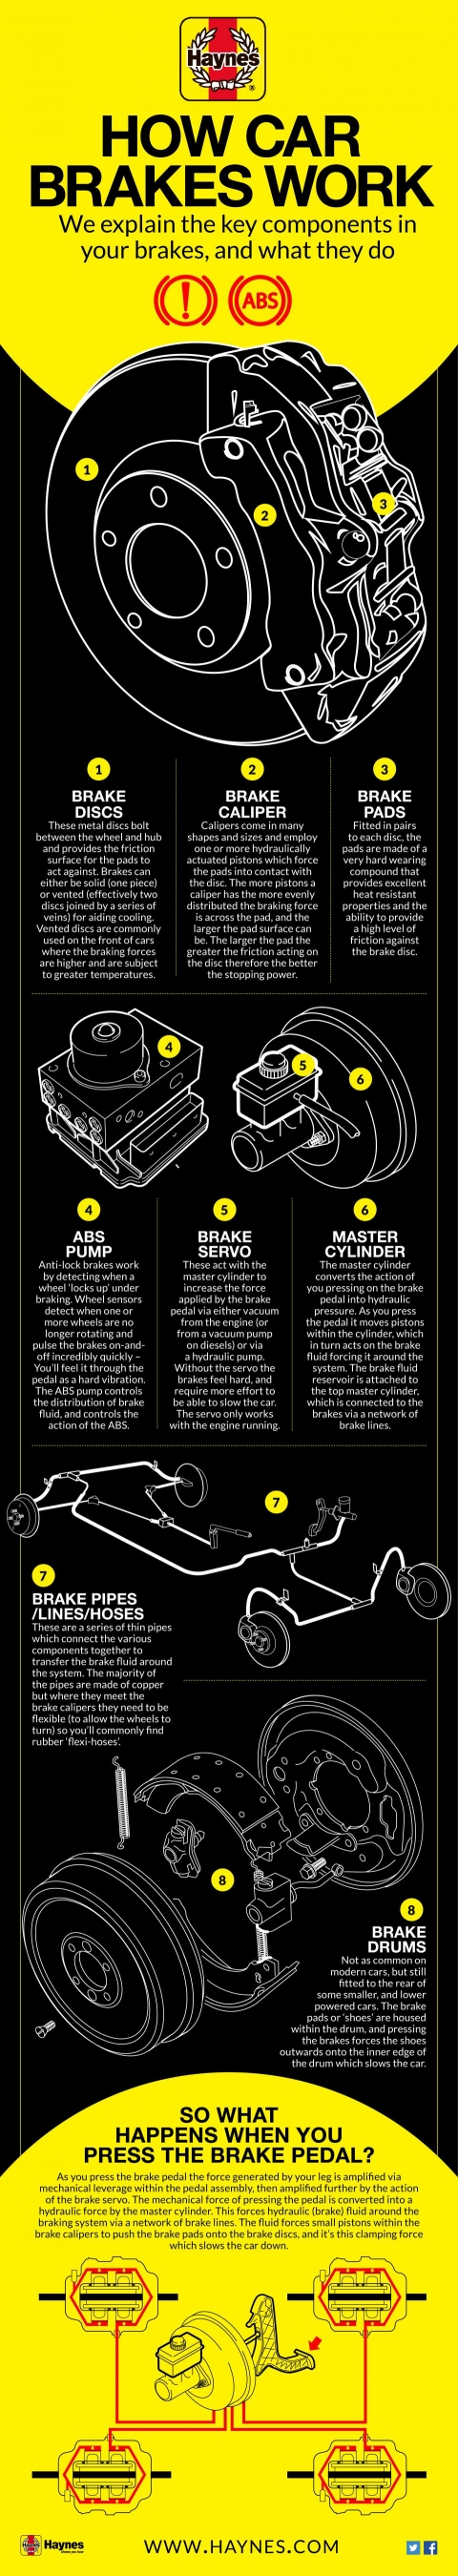 How do car brakes work?